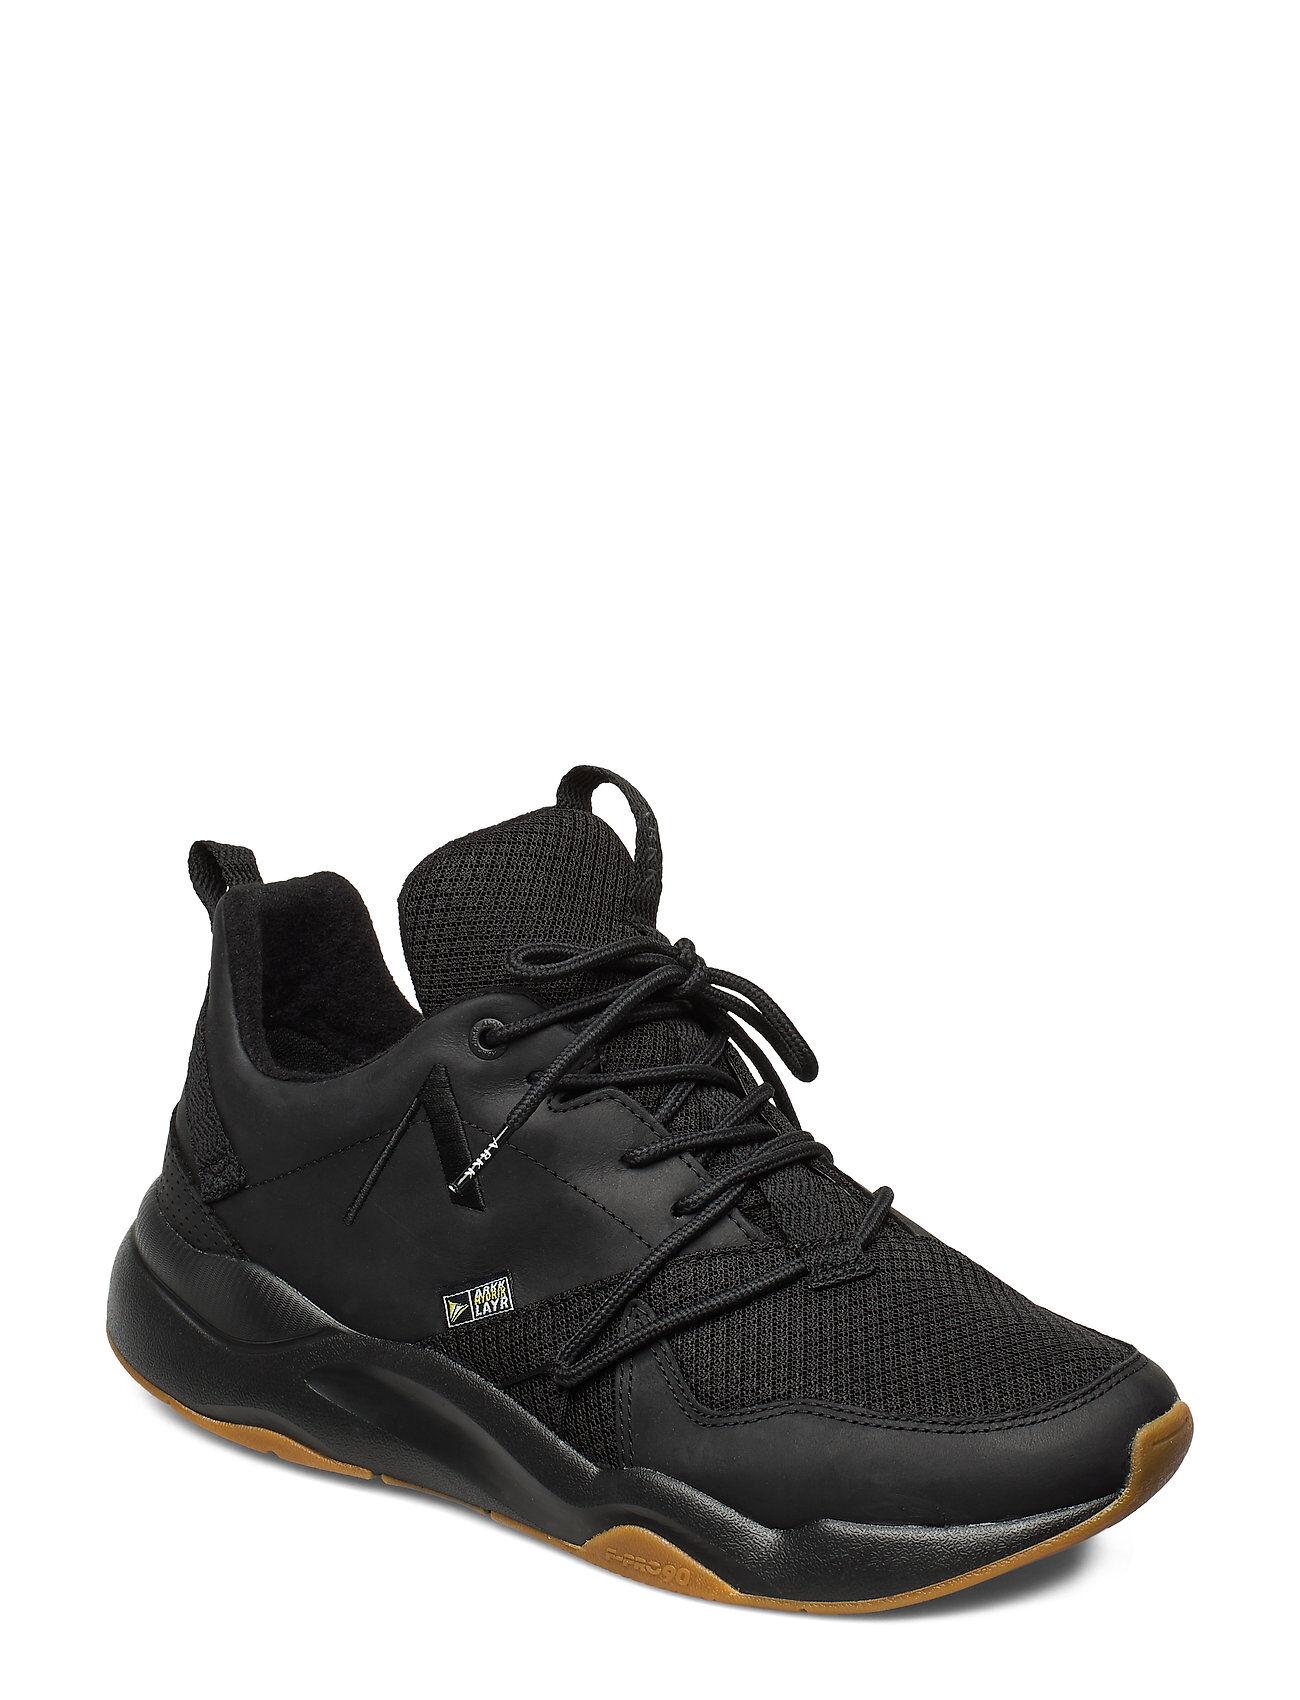 ARKK Copenhagen Asymtrix Mesh Hl F-Pro90 Black Gum- Matalavartiset Sneakerit Tennarit Musta ARKK Copenhagen